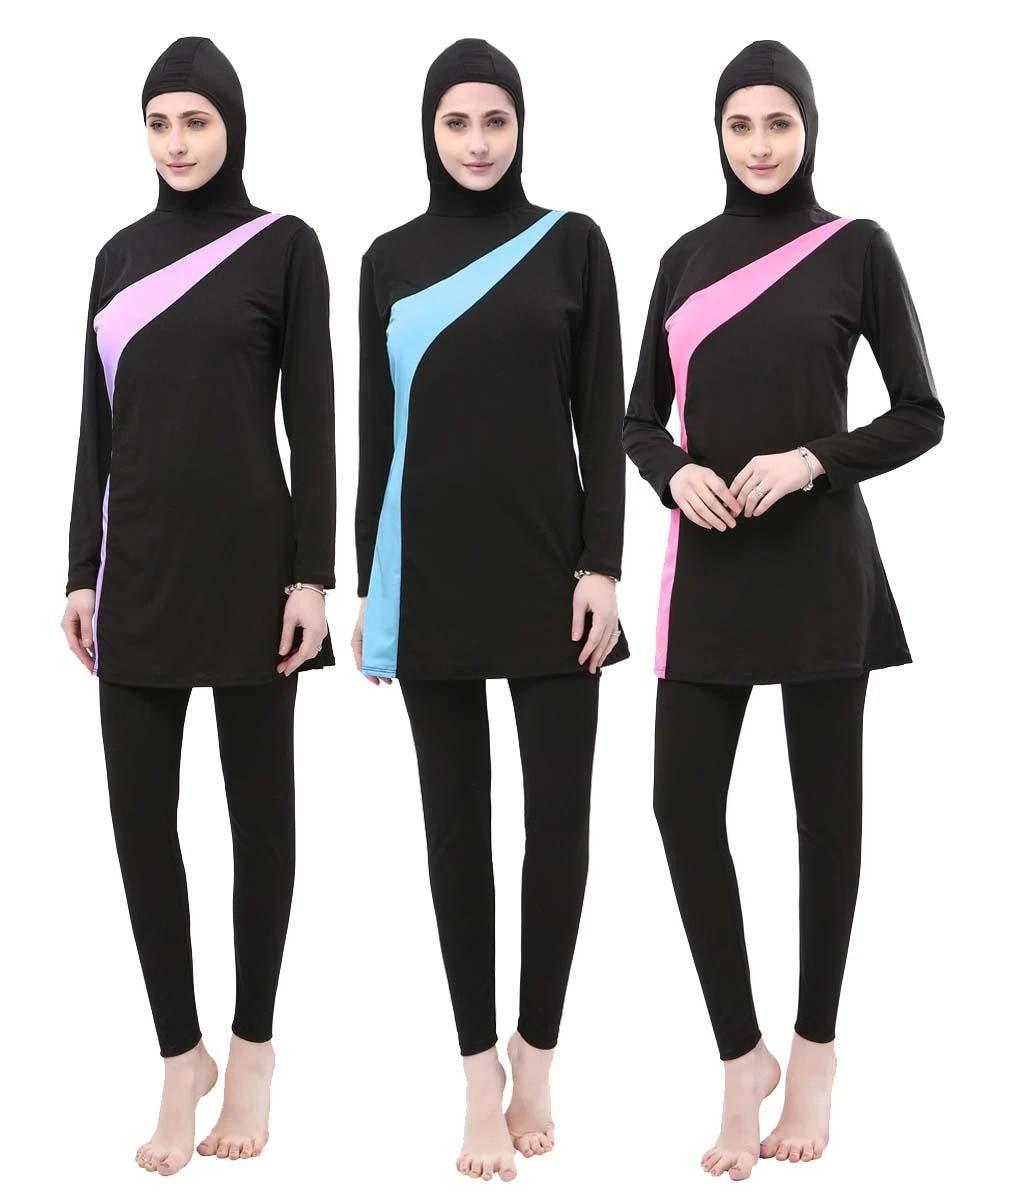 Modesty Muslim Women Swimwear Burkini Swimsuit Full Cover Islamic Beachwear New